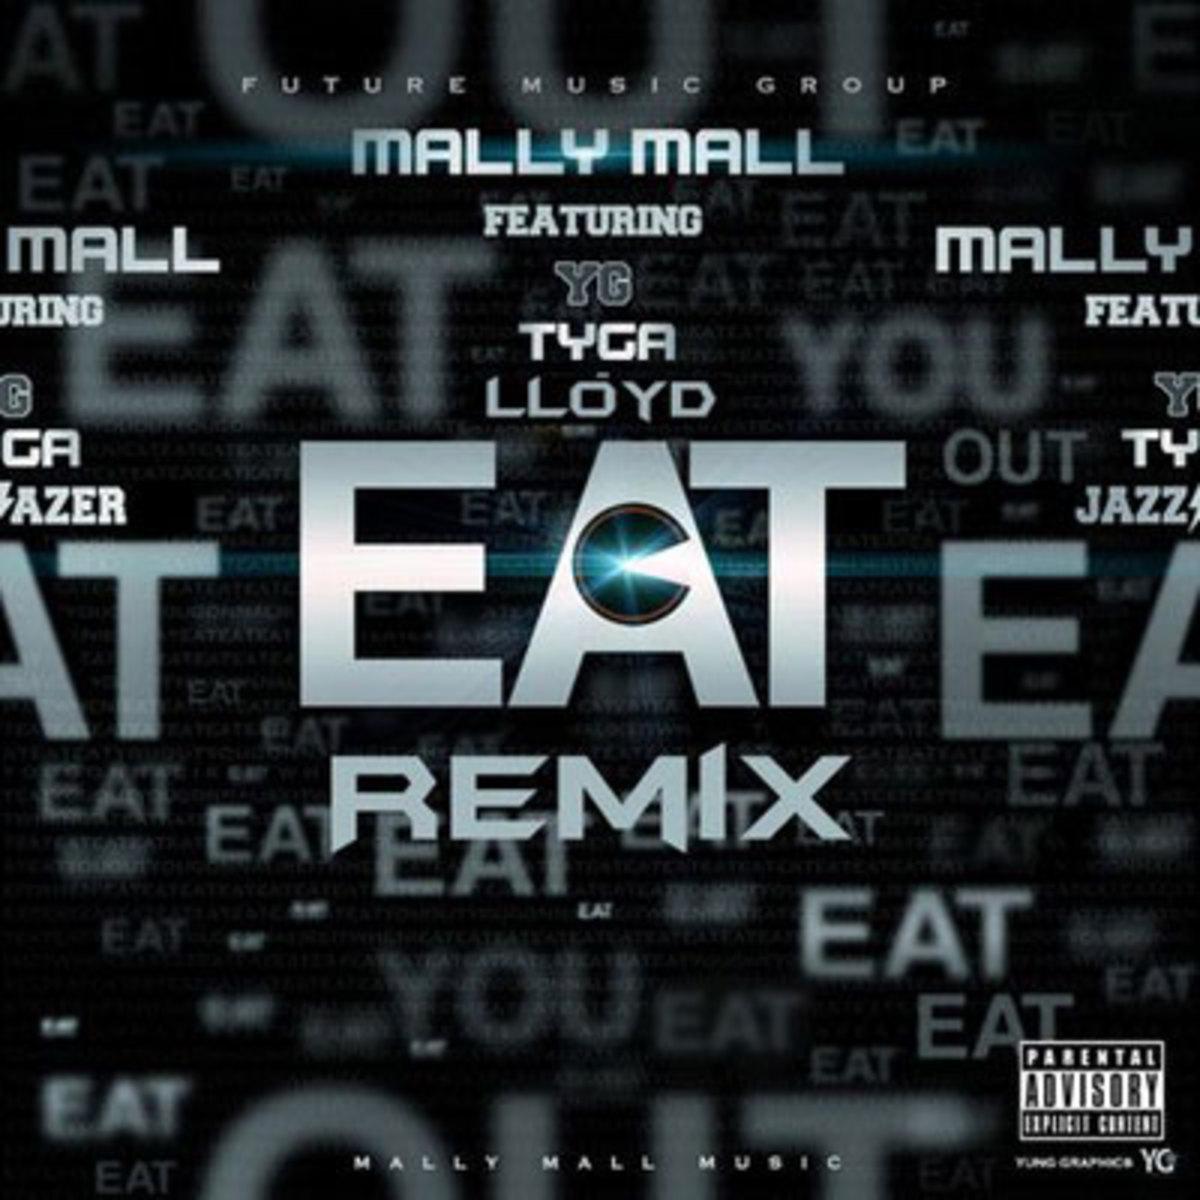 mallymall-eatremix.jpg